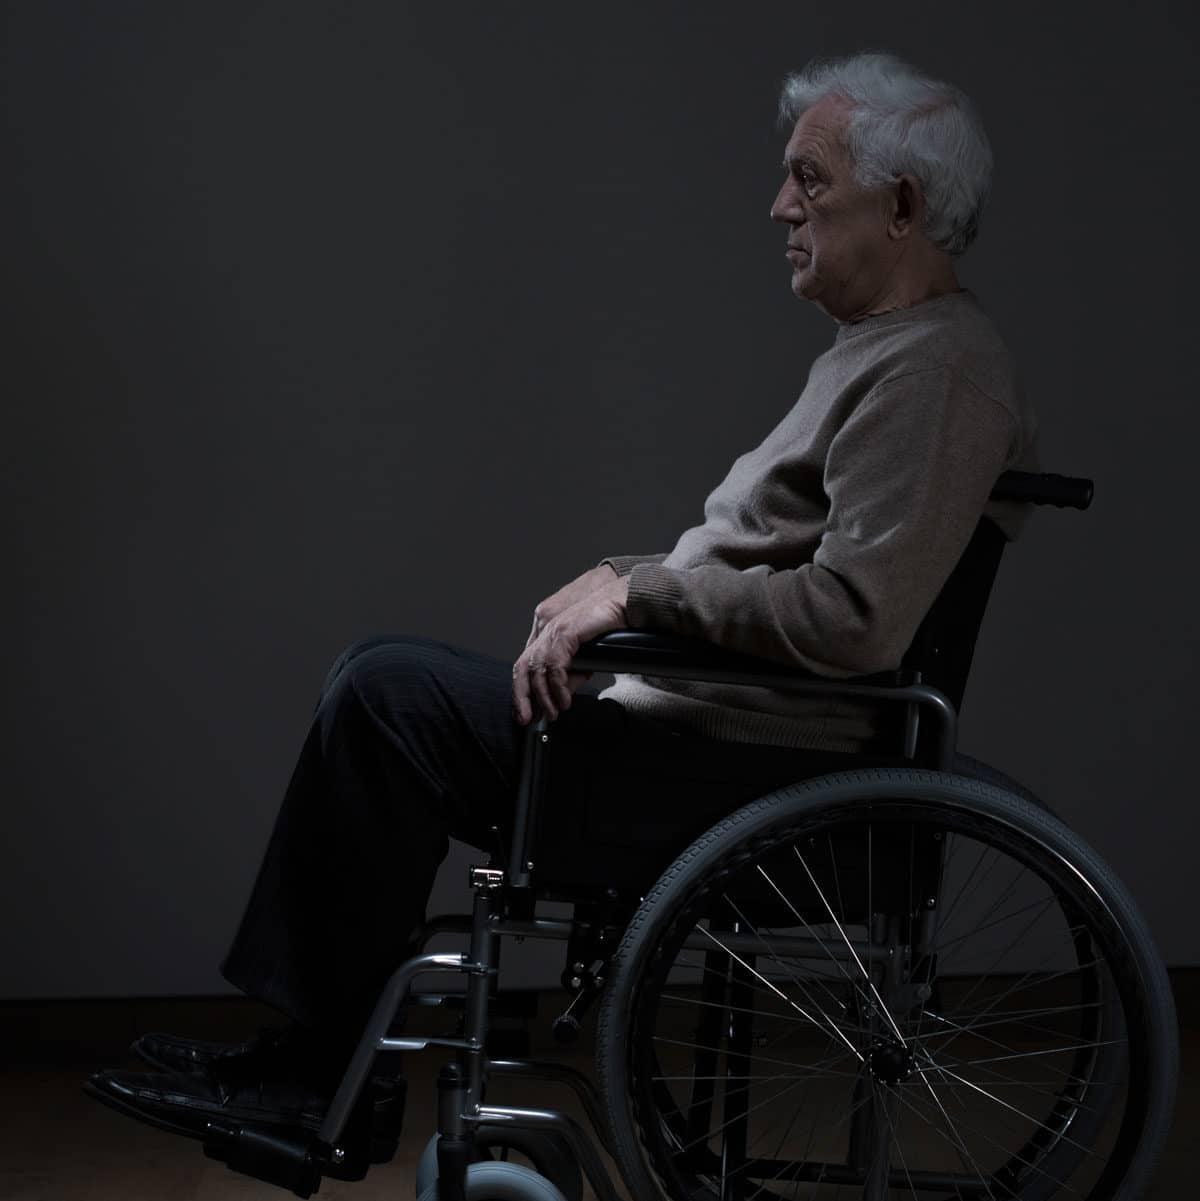 nursing home abuse lawsuits